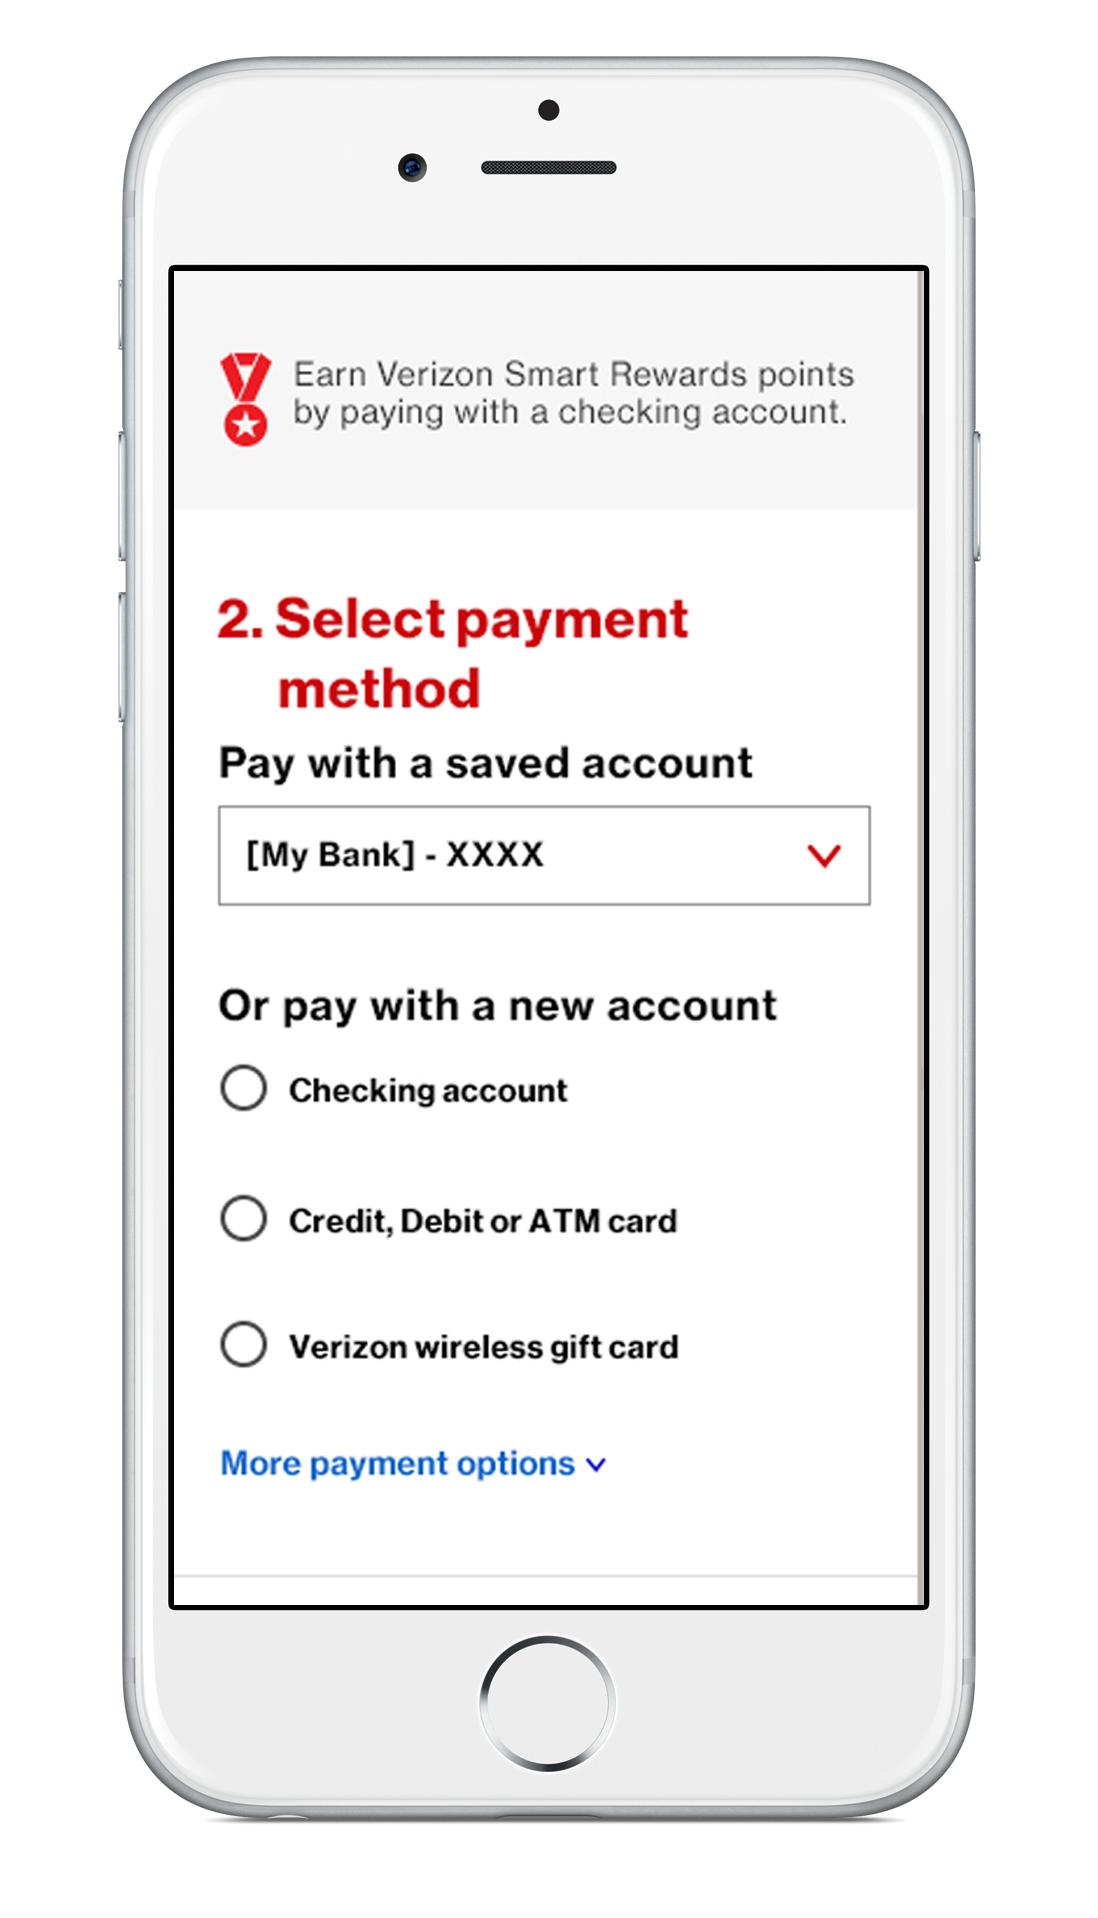 Verizon_Comps_indevice_payments2.jpg